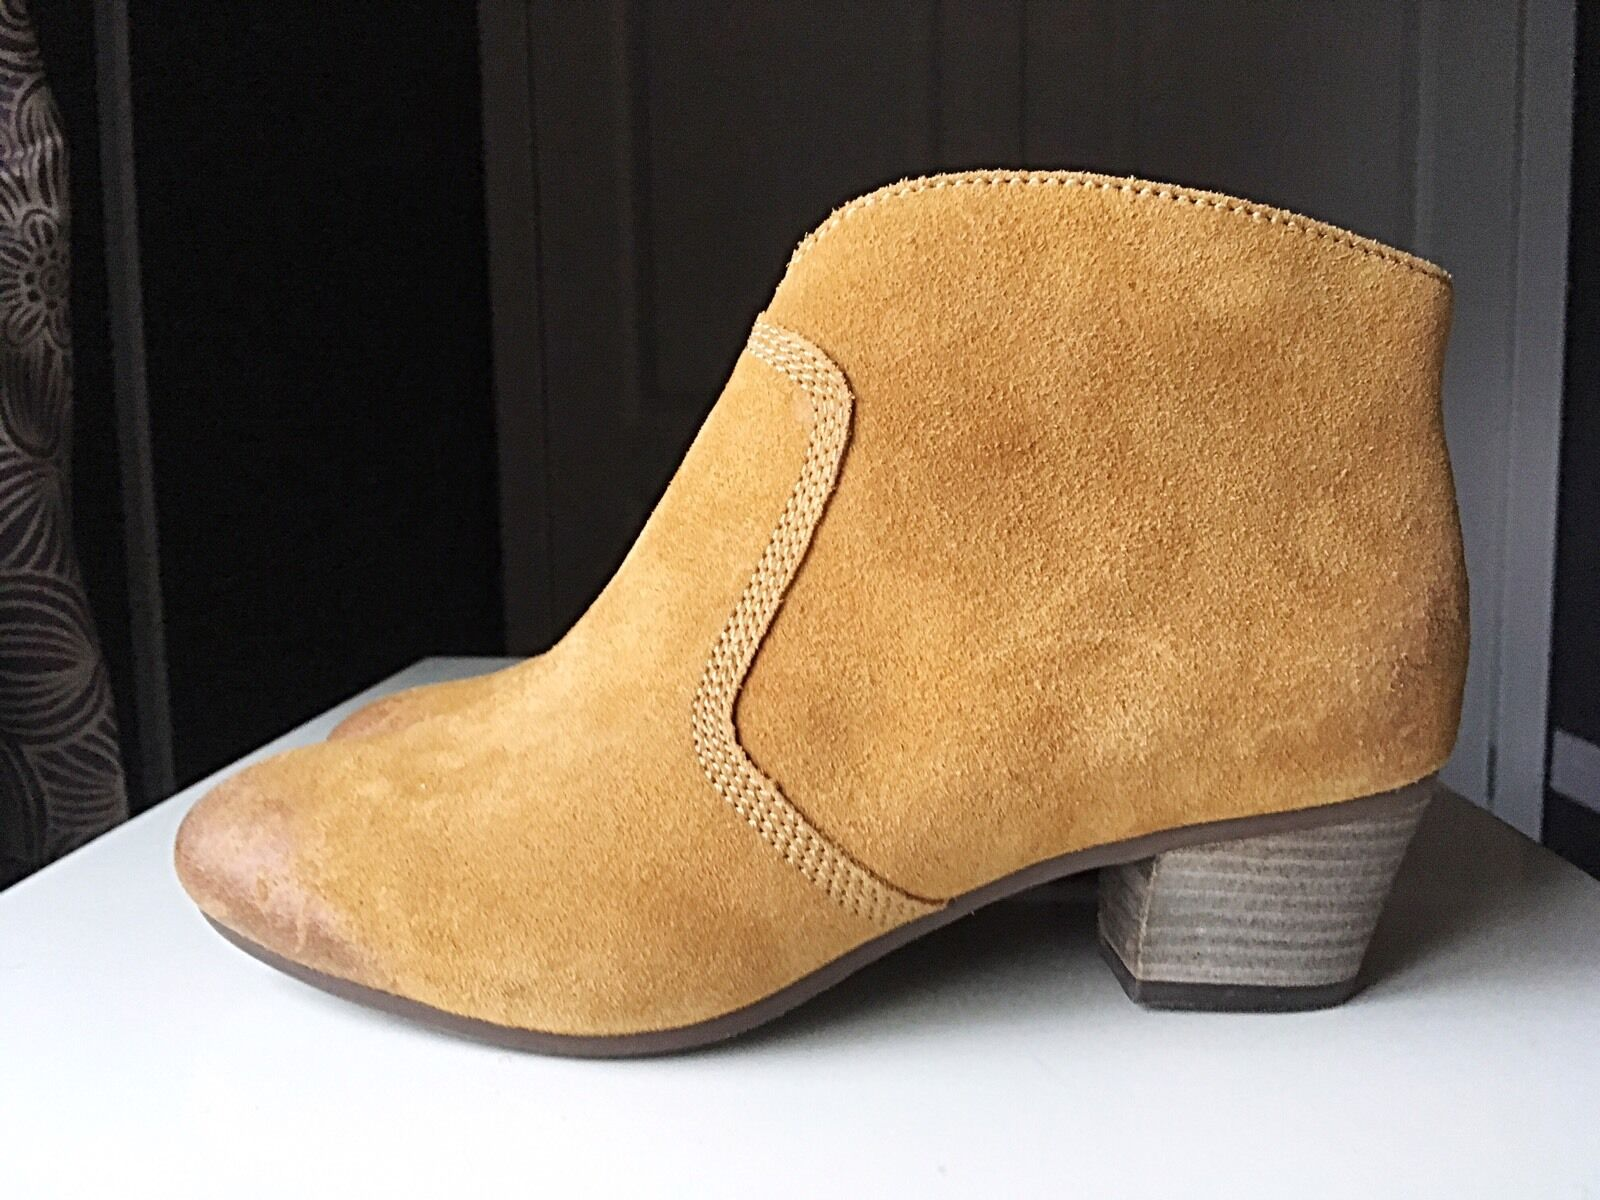 Clarks Softwear Cuir Femmes Femmes Bottines Talon Haut Chaussure Botte Taille 4 37 D